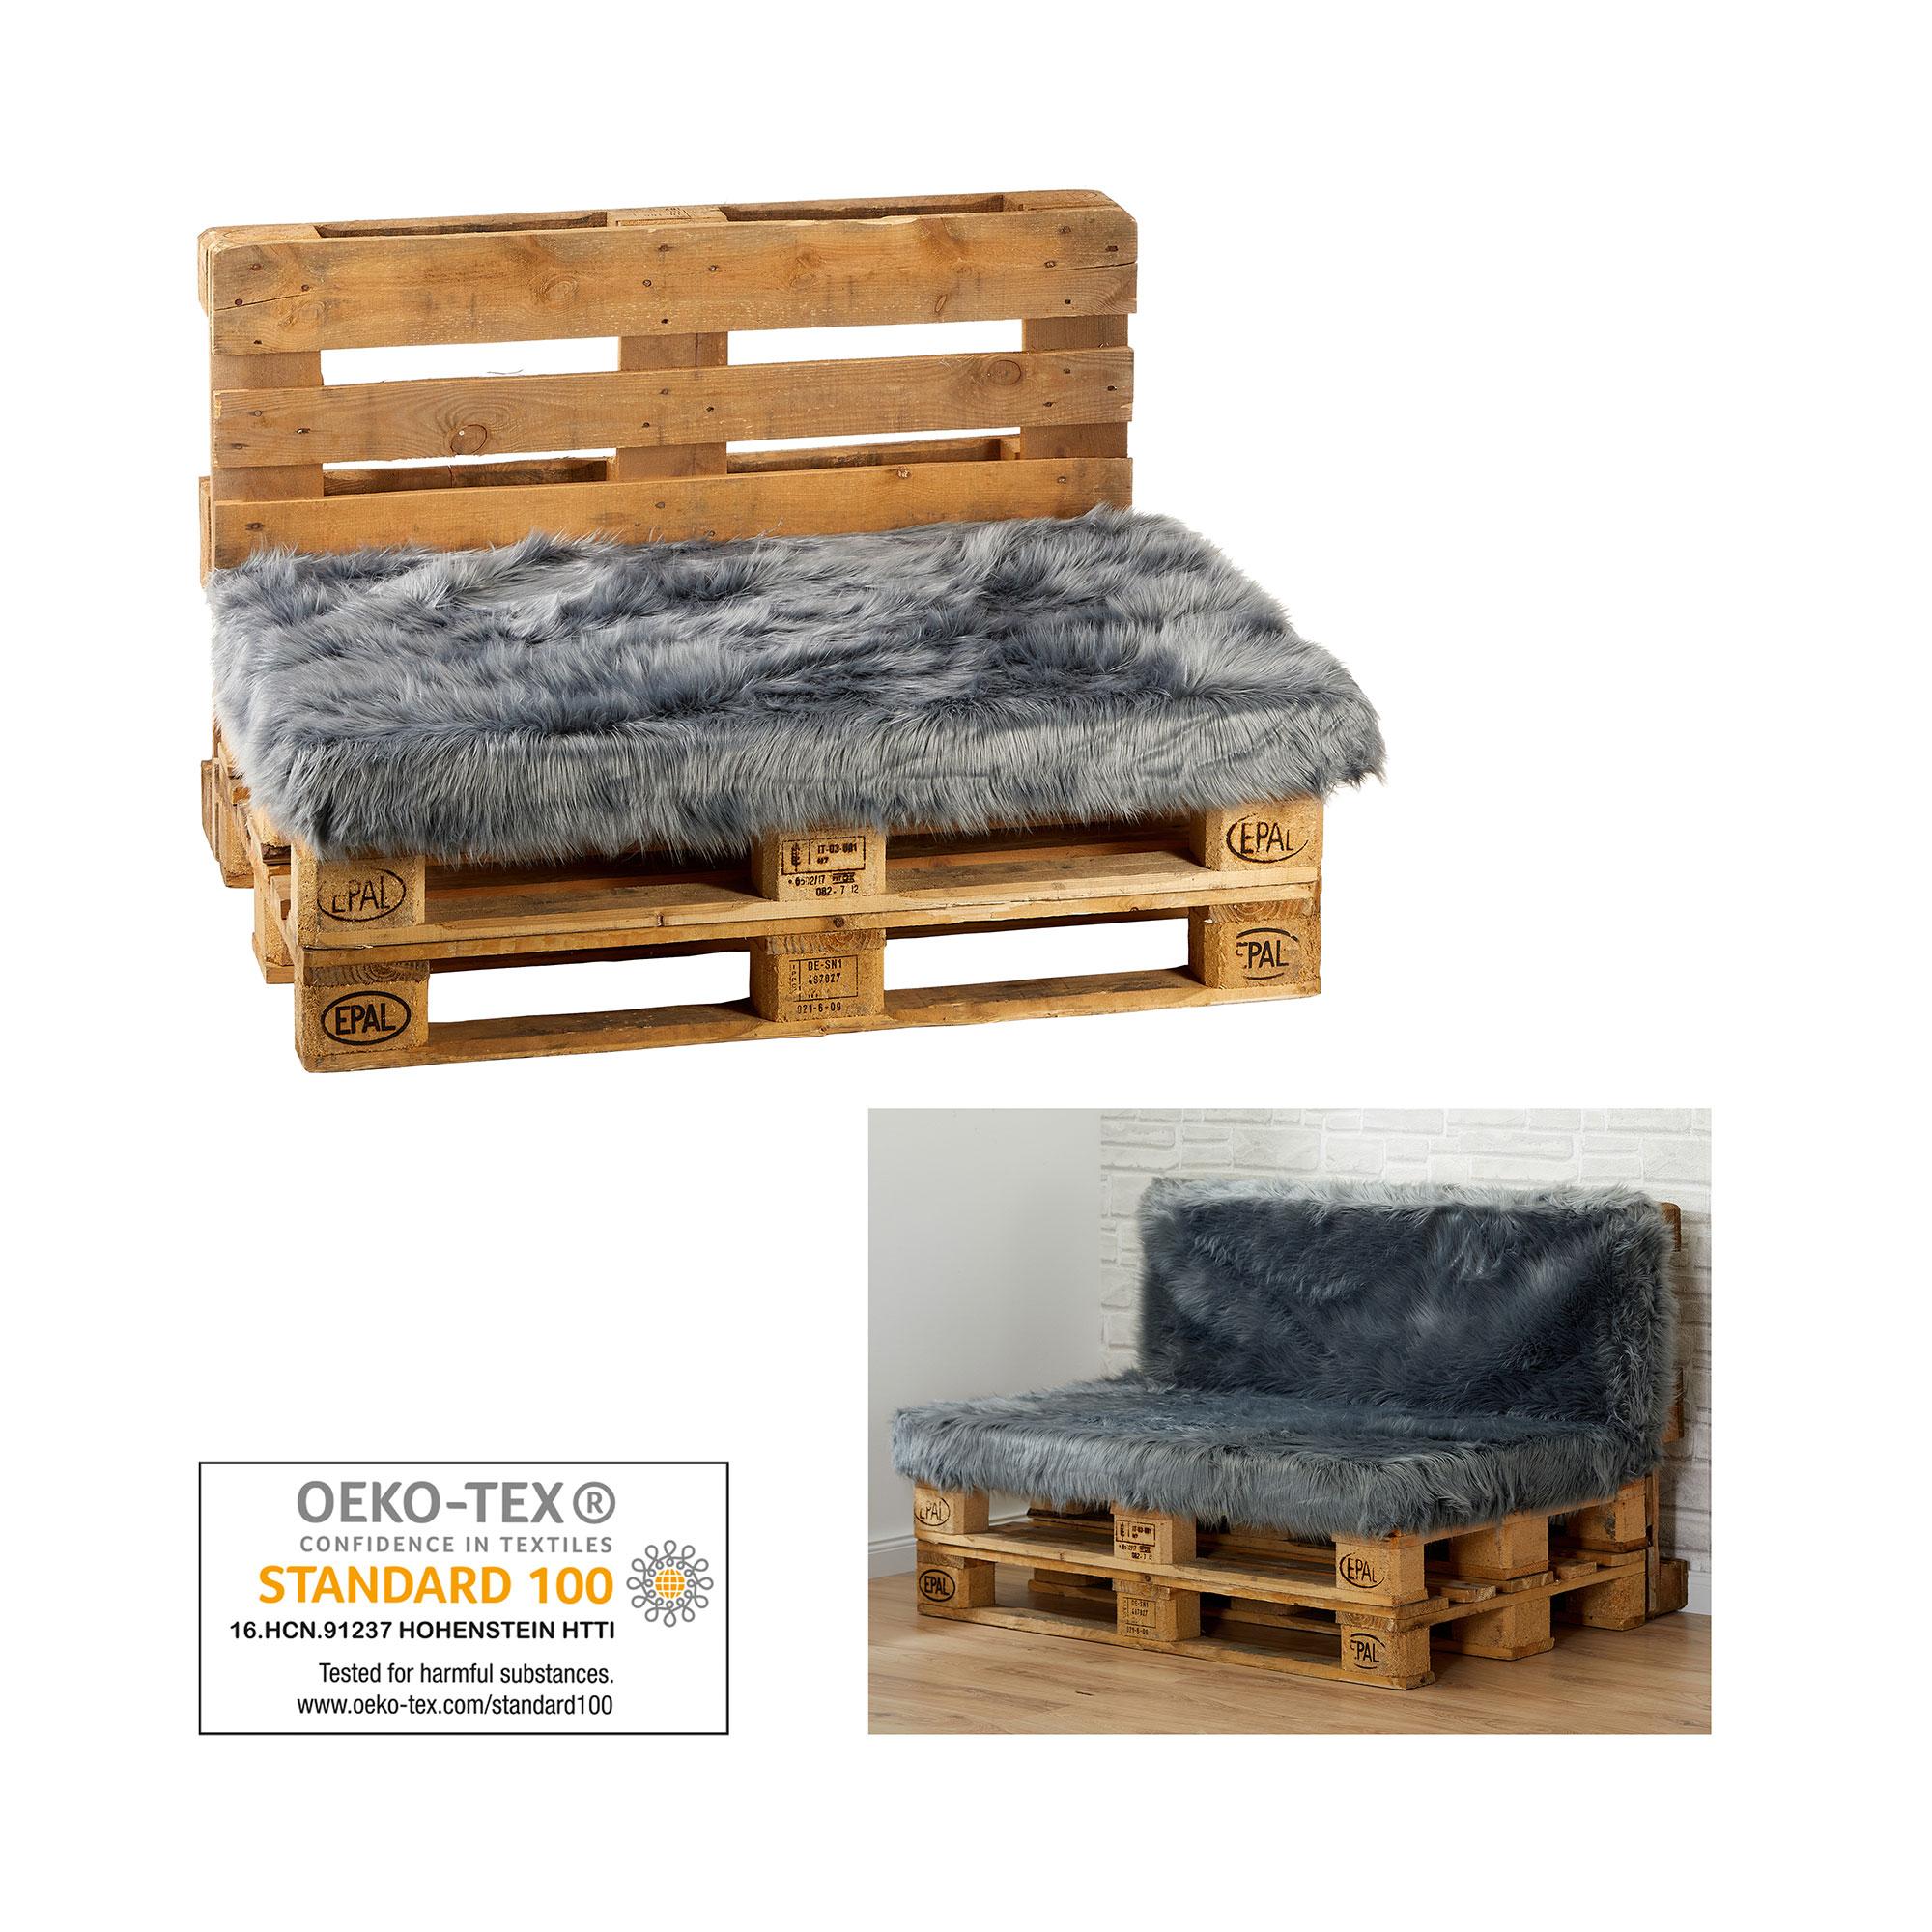 Palettenkissen Sitzauflage Kissen Paletten Sofa Möbel Fell-Optik 80x120cm Grau